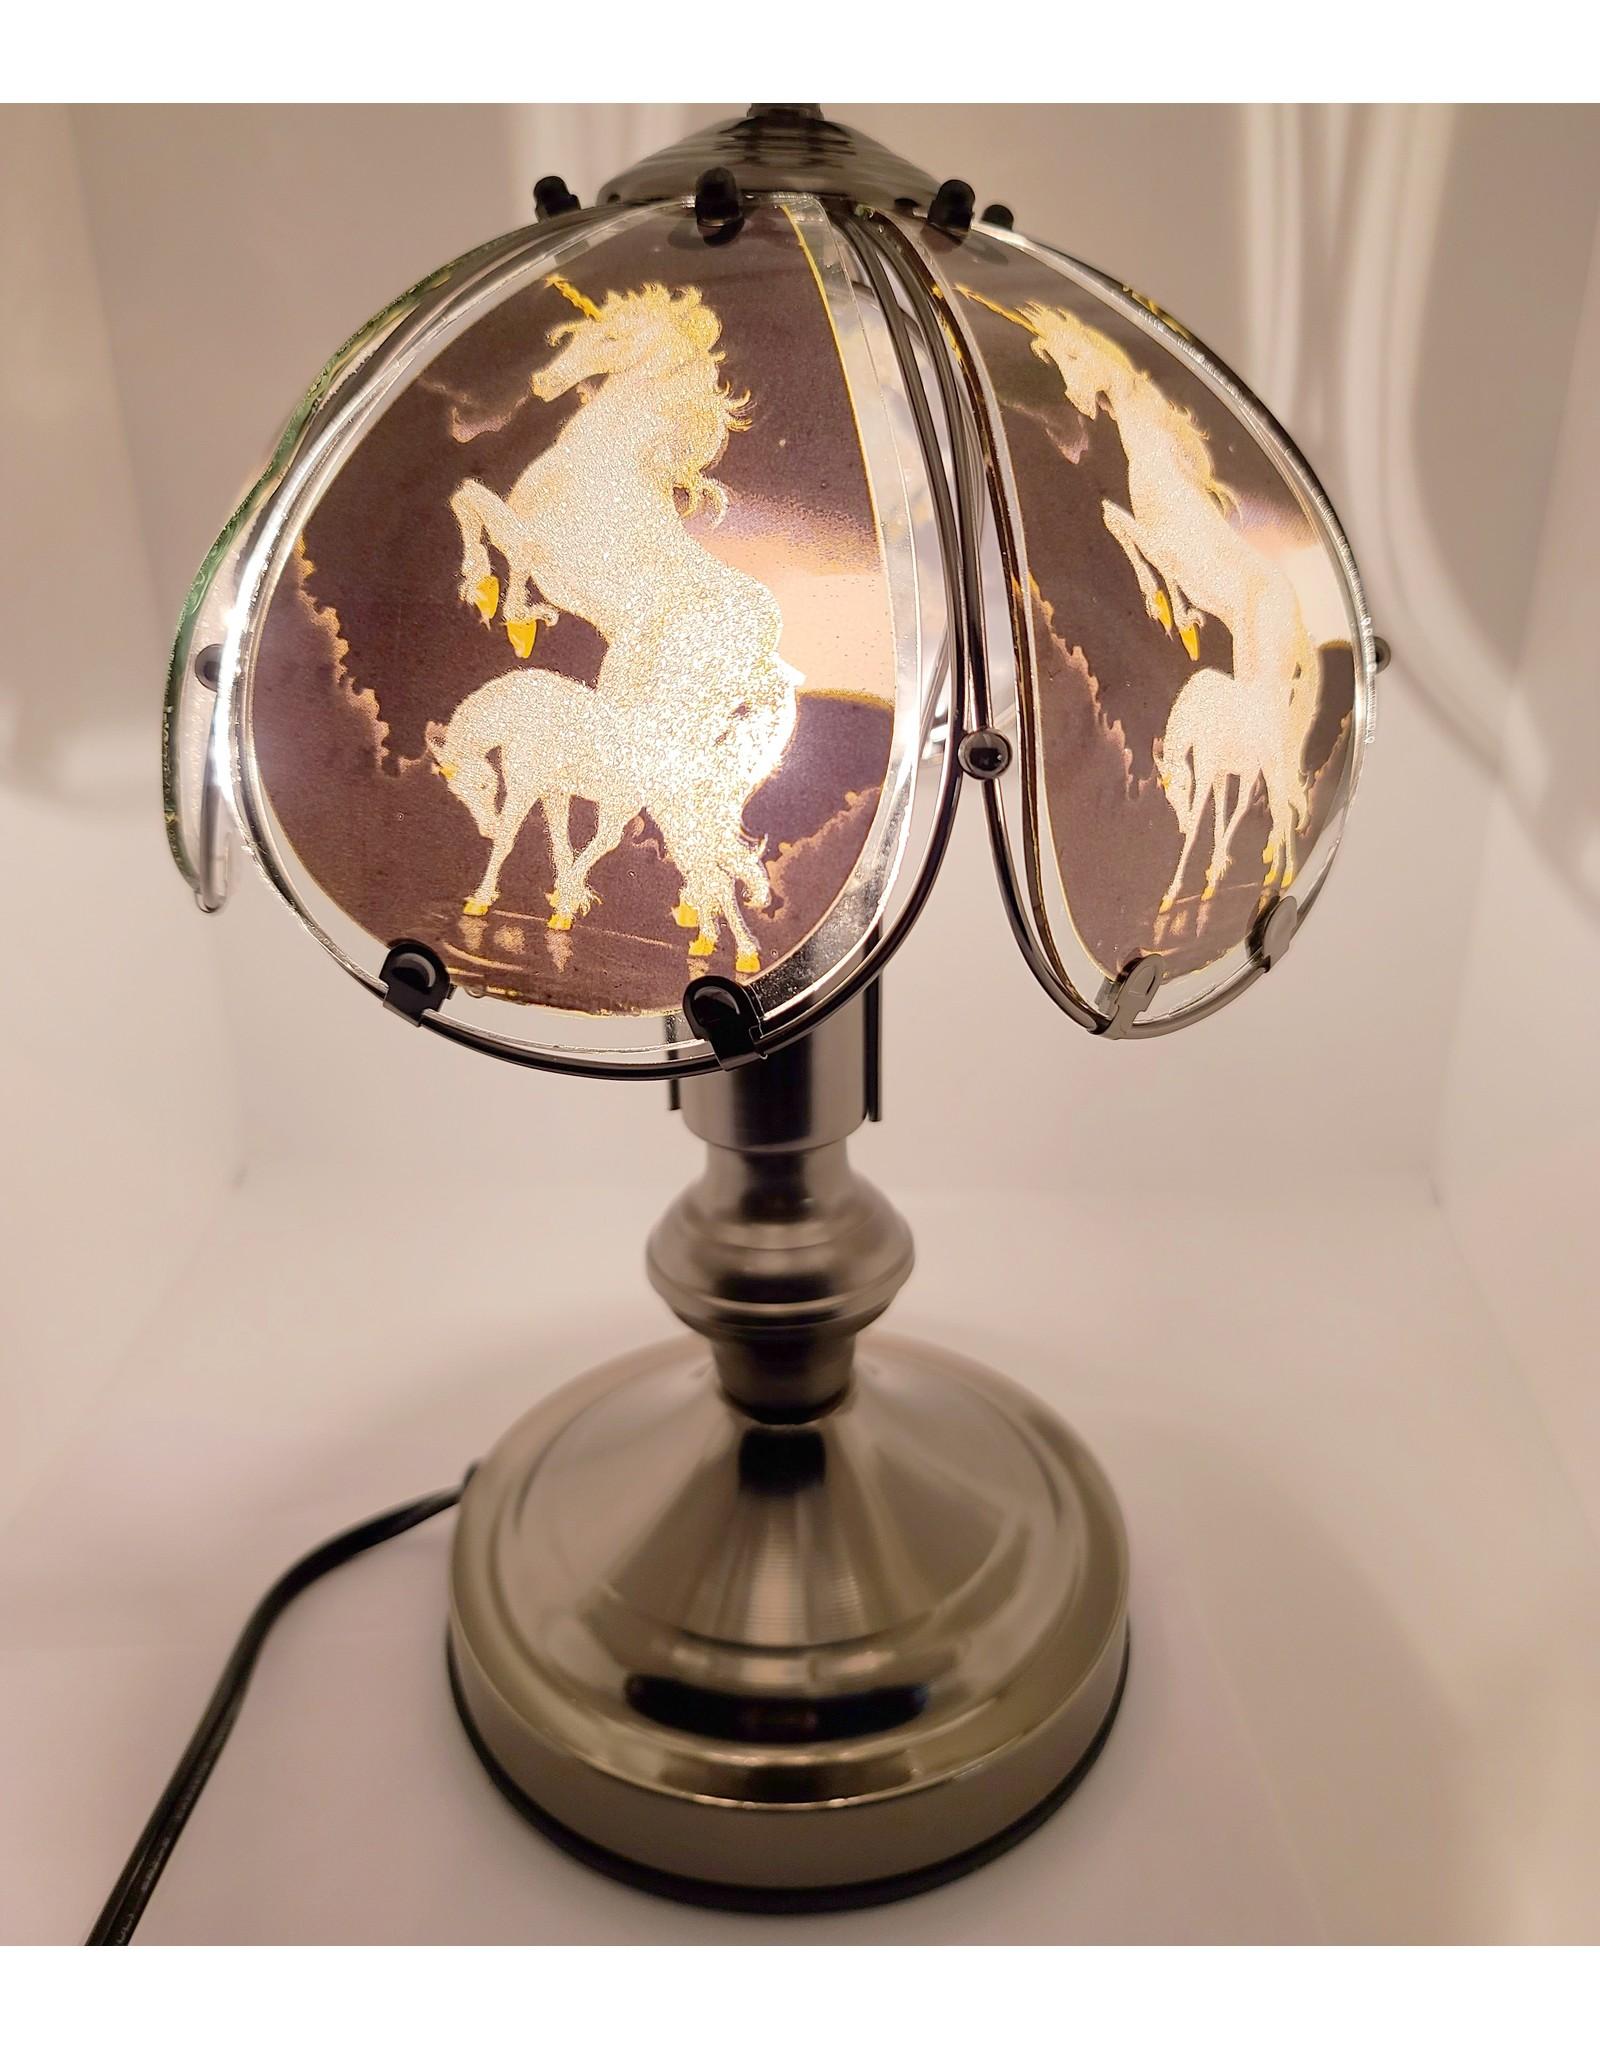 Unicorn Stained Glass Tactile Lamp The Unicornery